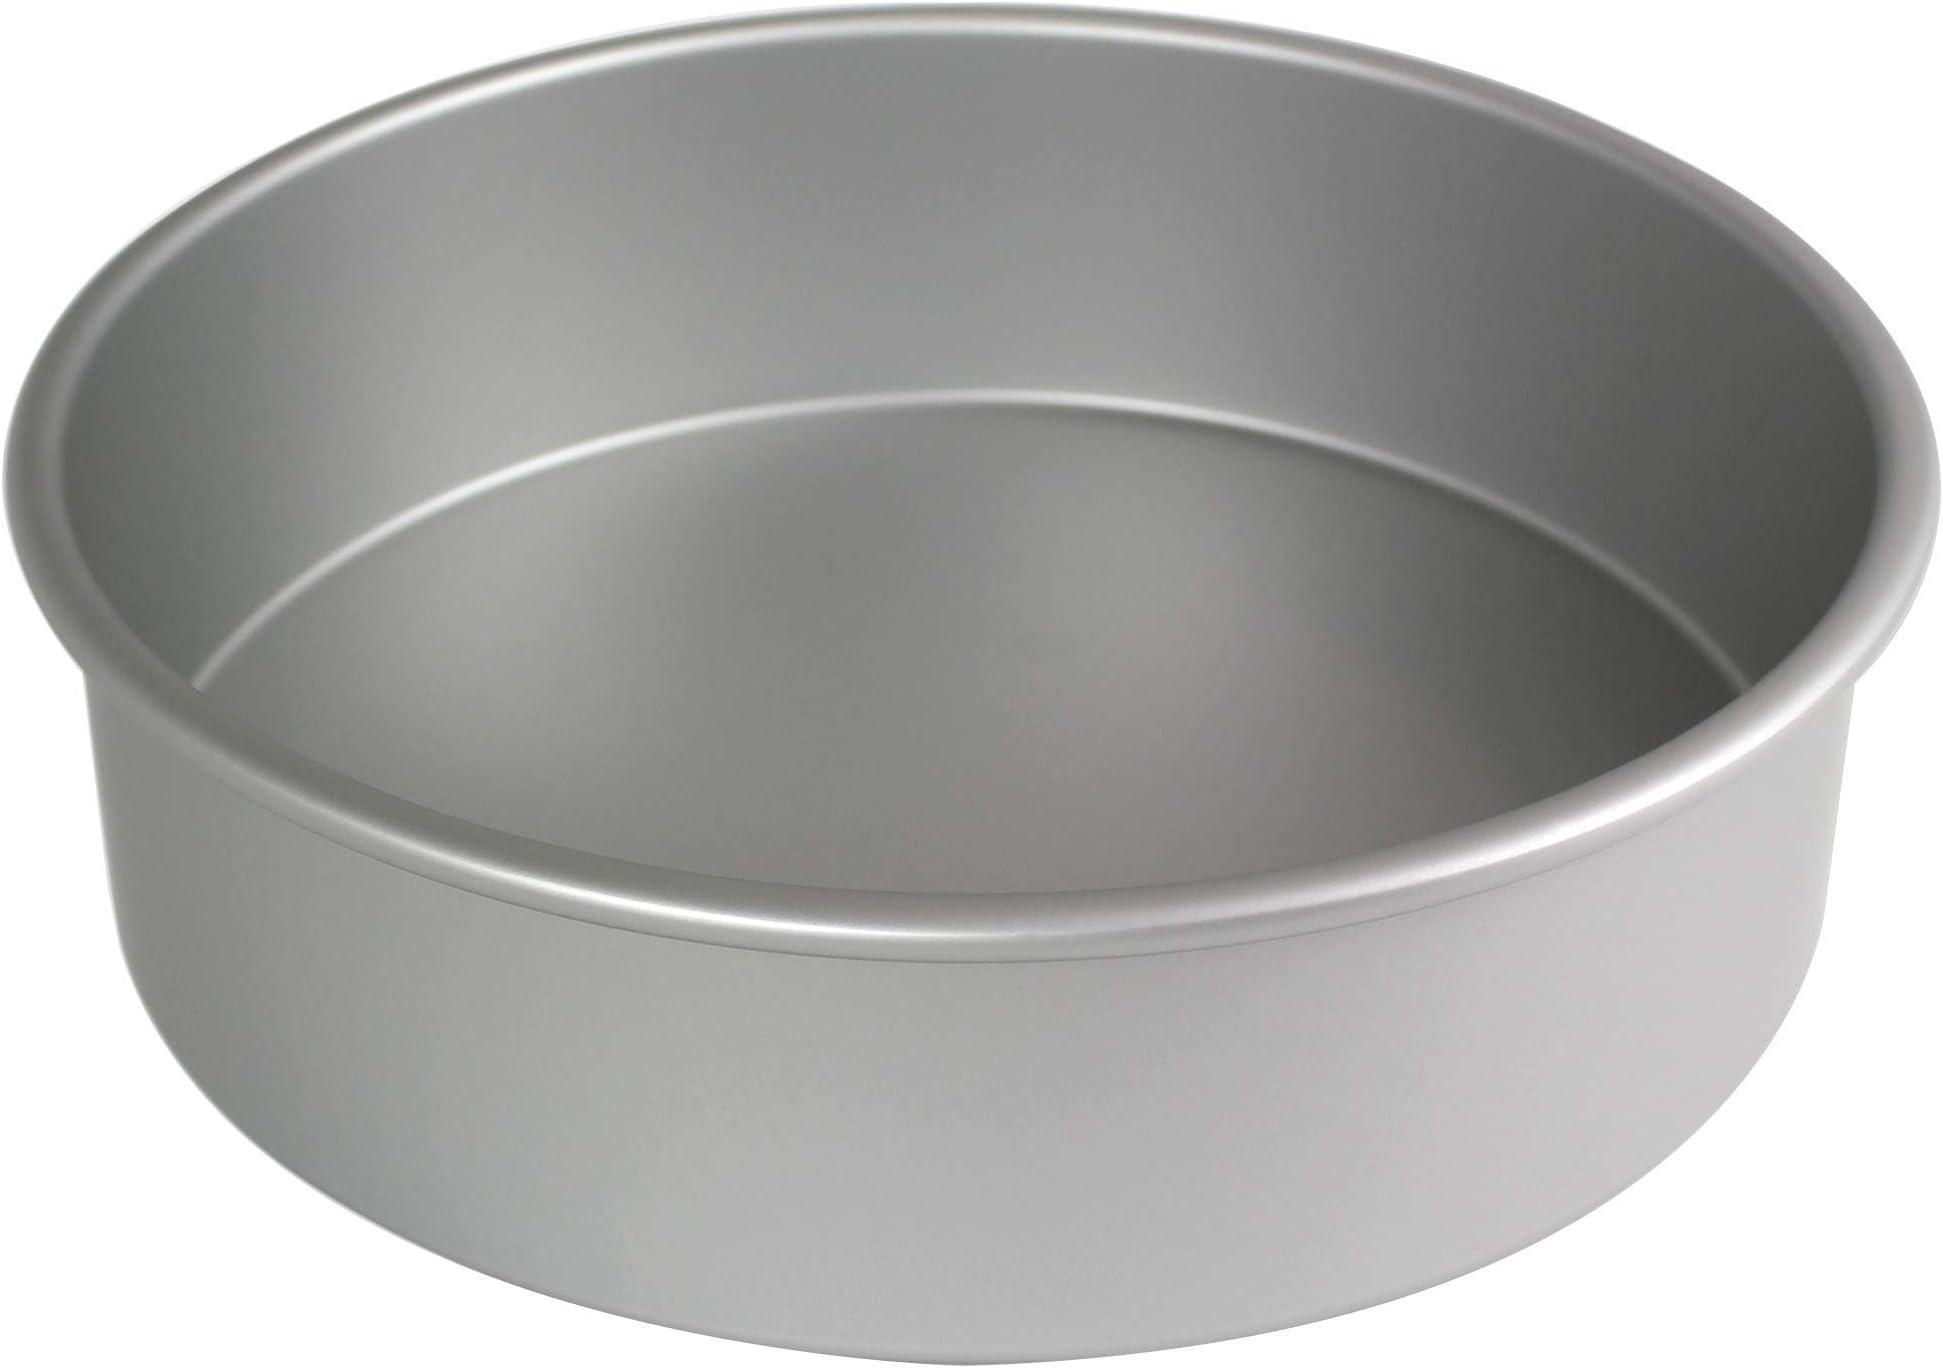 PME Round Cake Pan, 12-Inch